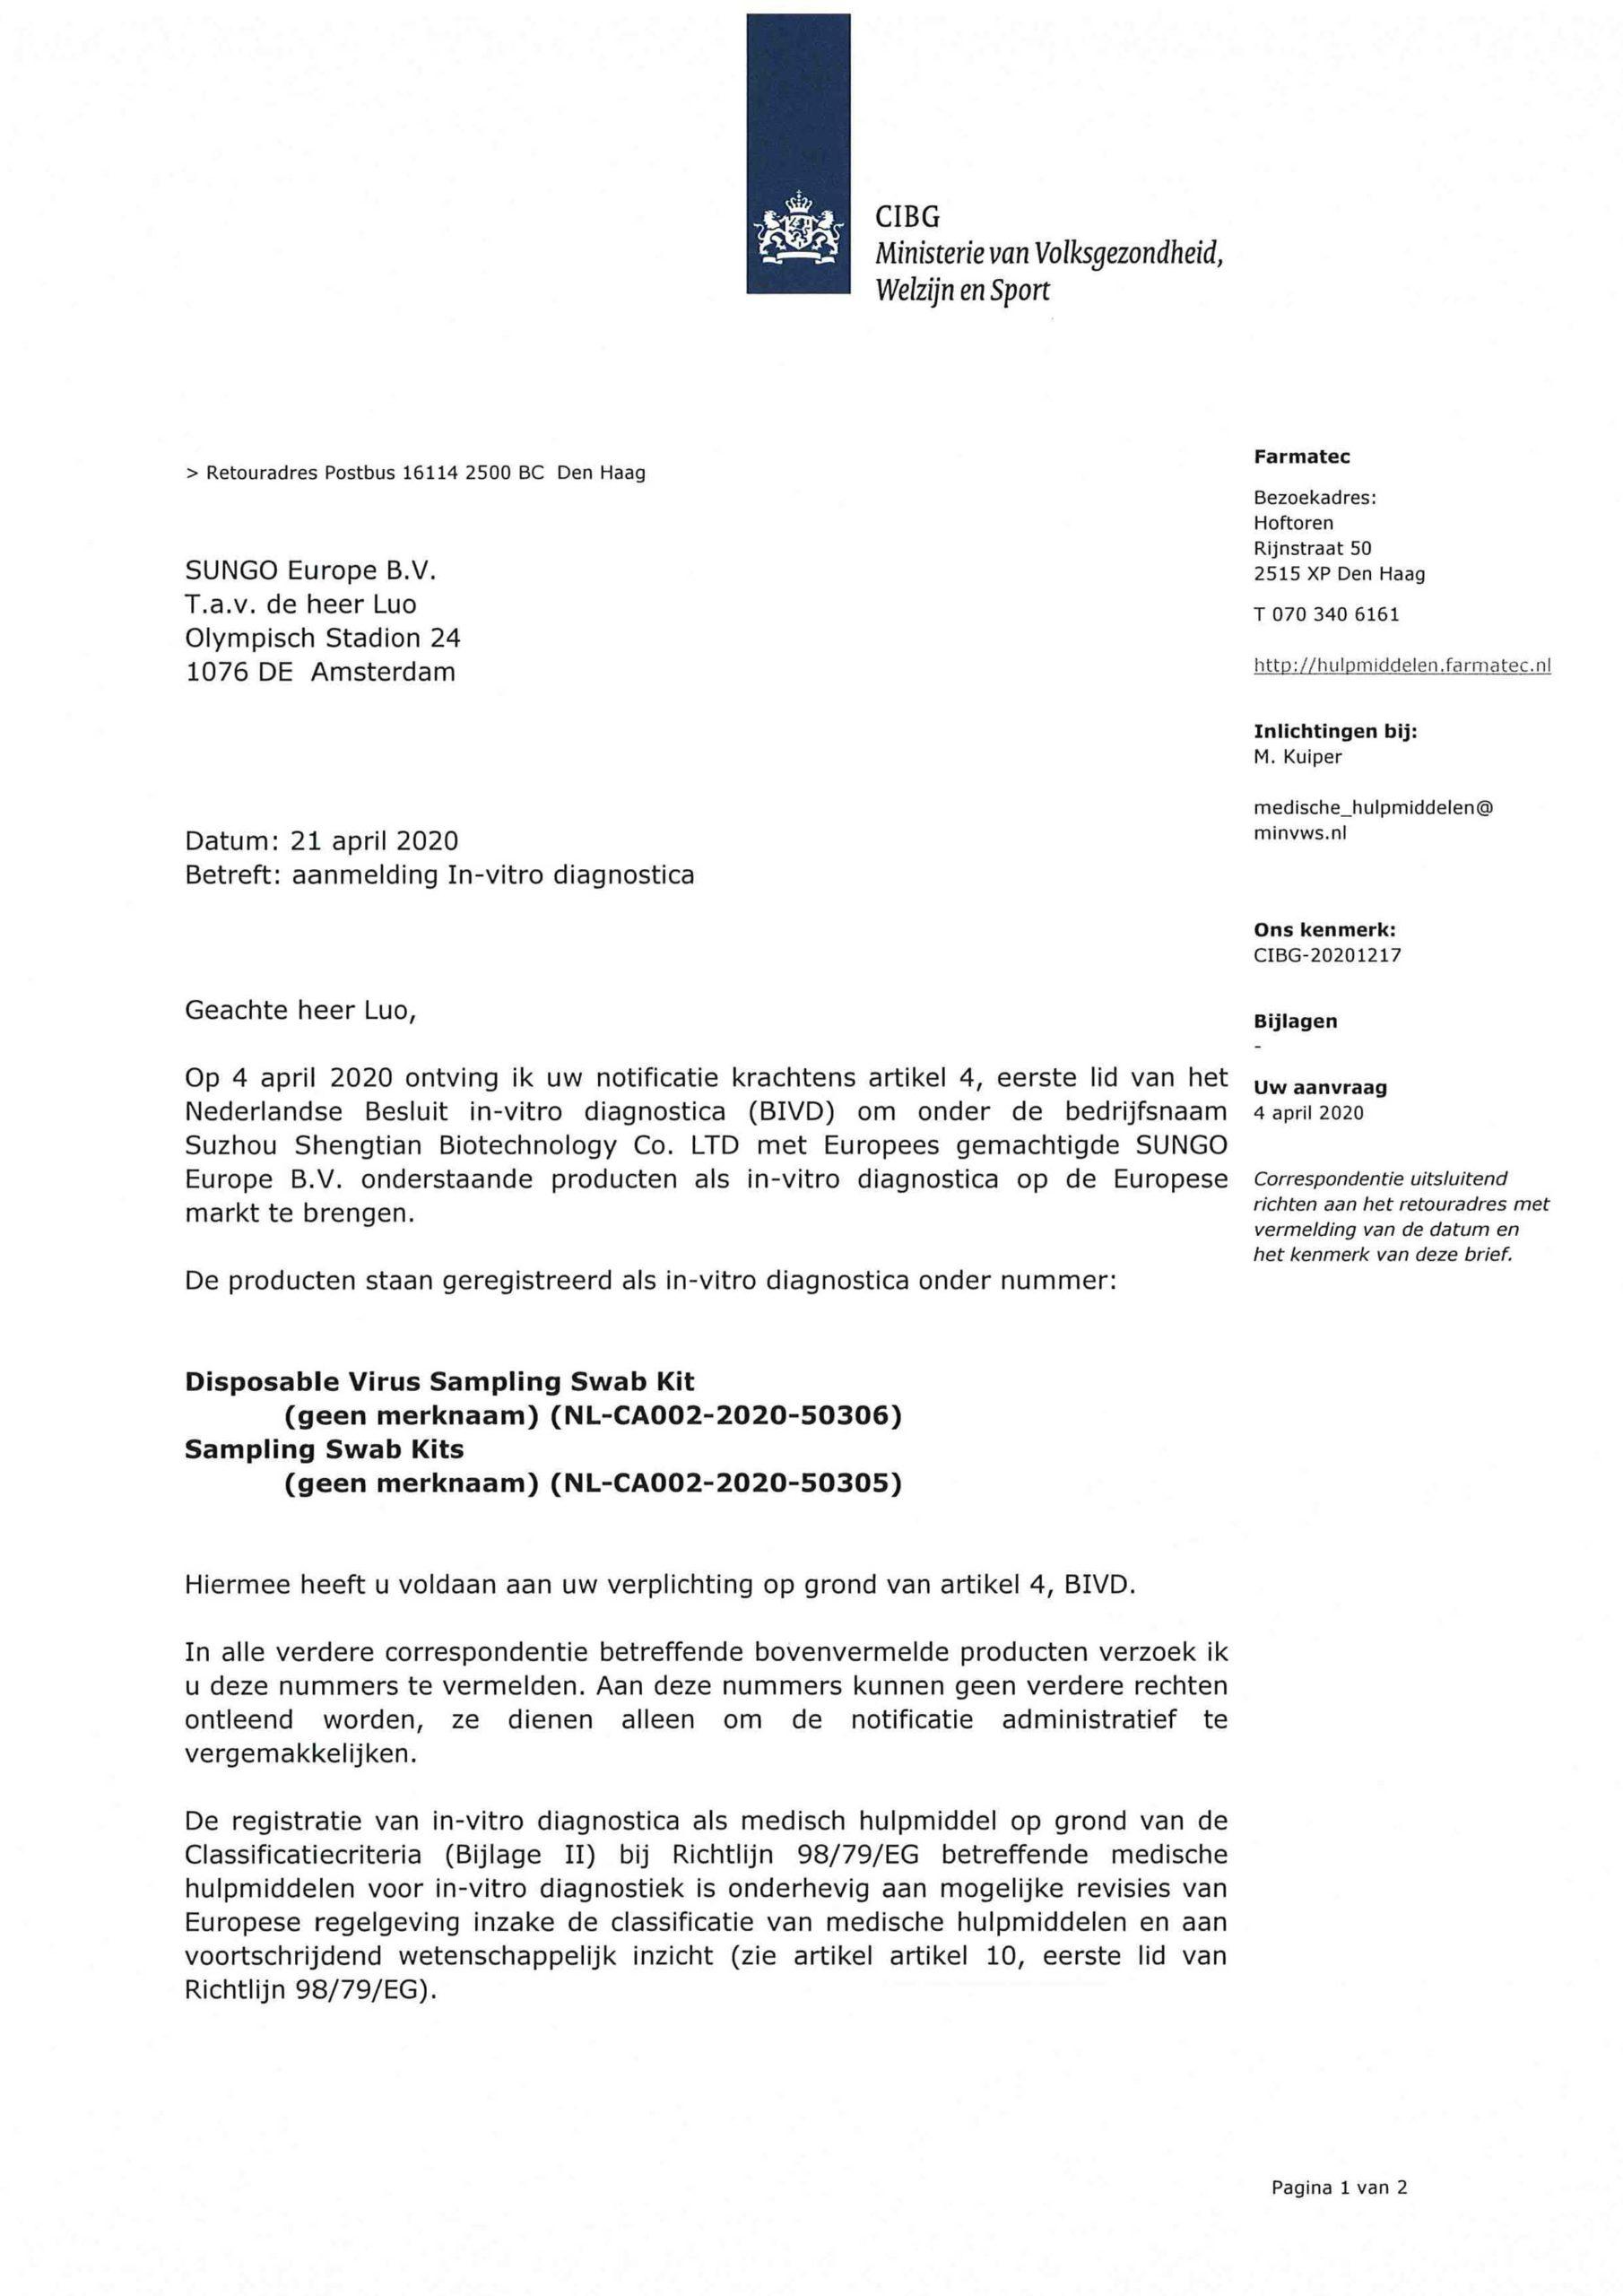 CIBG Certificate